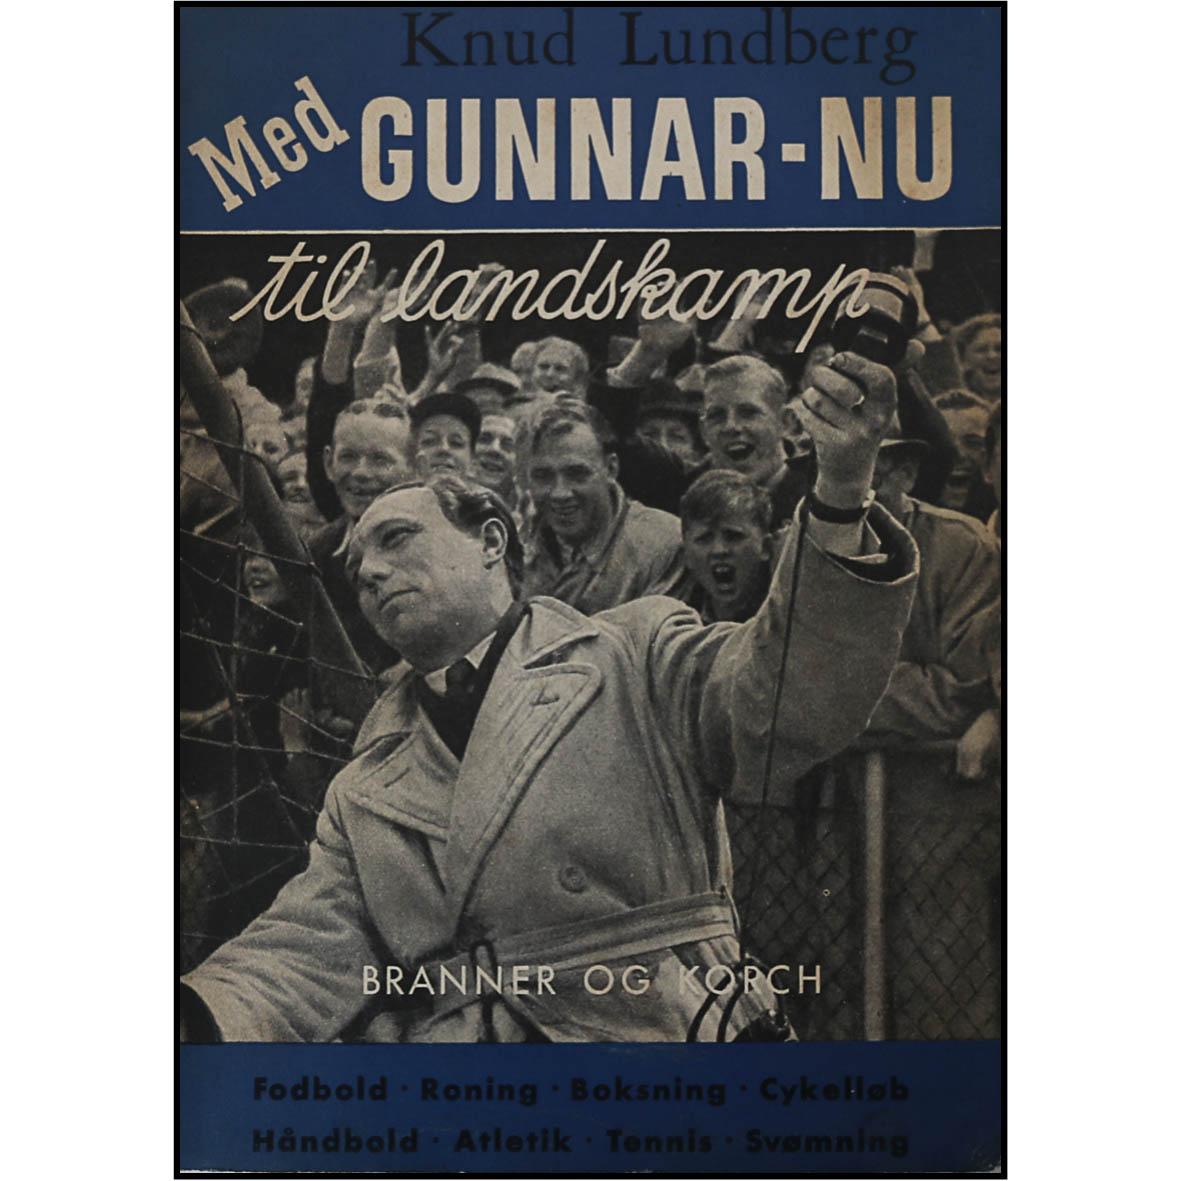 Knud Lundberg - Med Gunnar Nu til landskamp